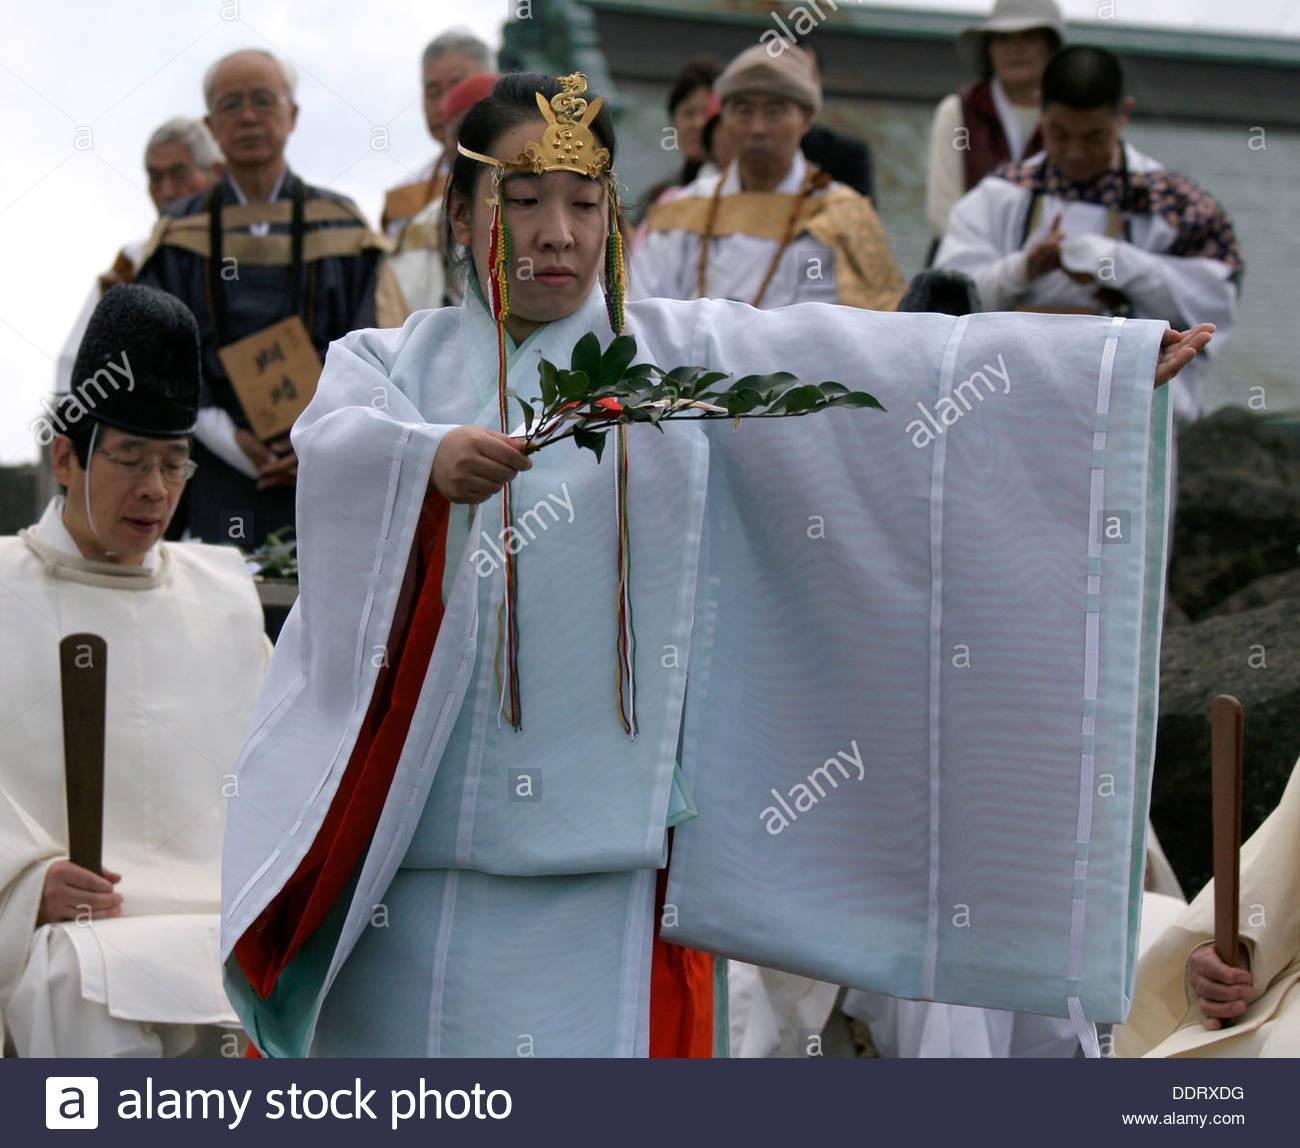 Shinto priestess, Shinto sacred fire ritual, Hakone, Japan, 2005. Artist: Eddie Ozaki Owen - Stock Image